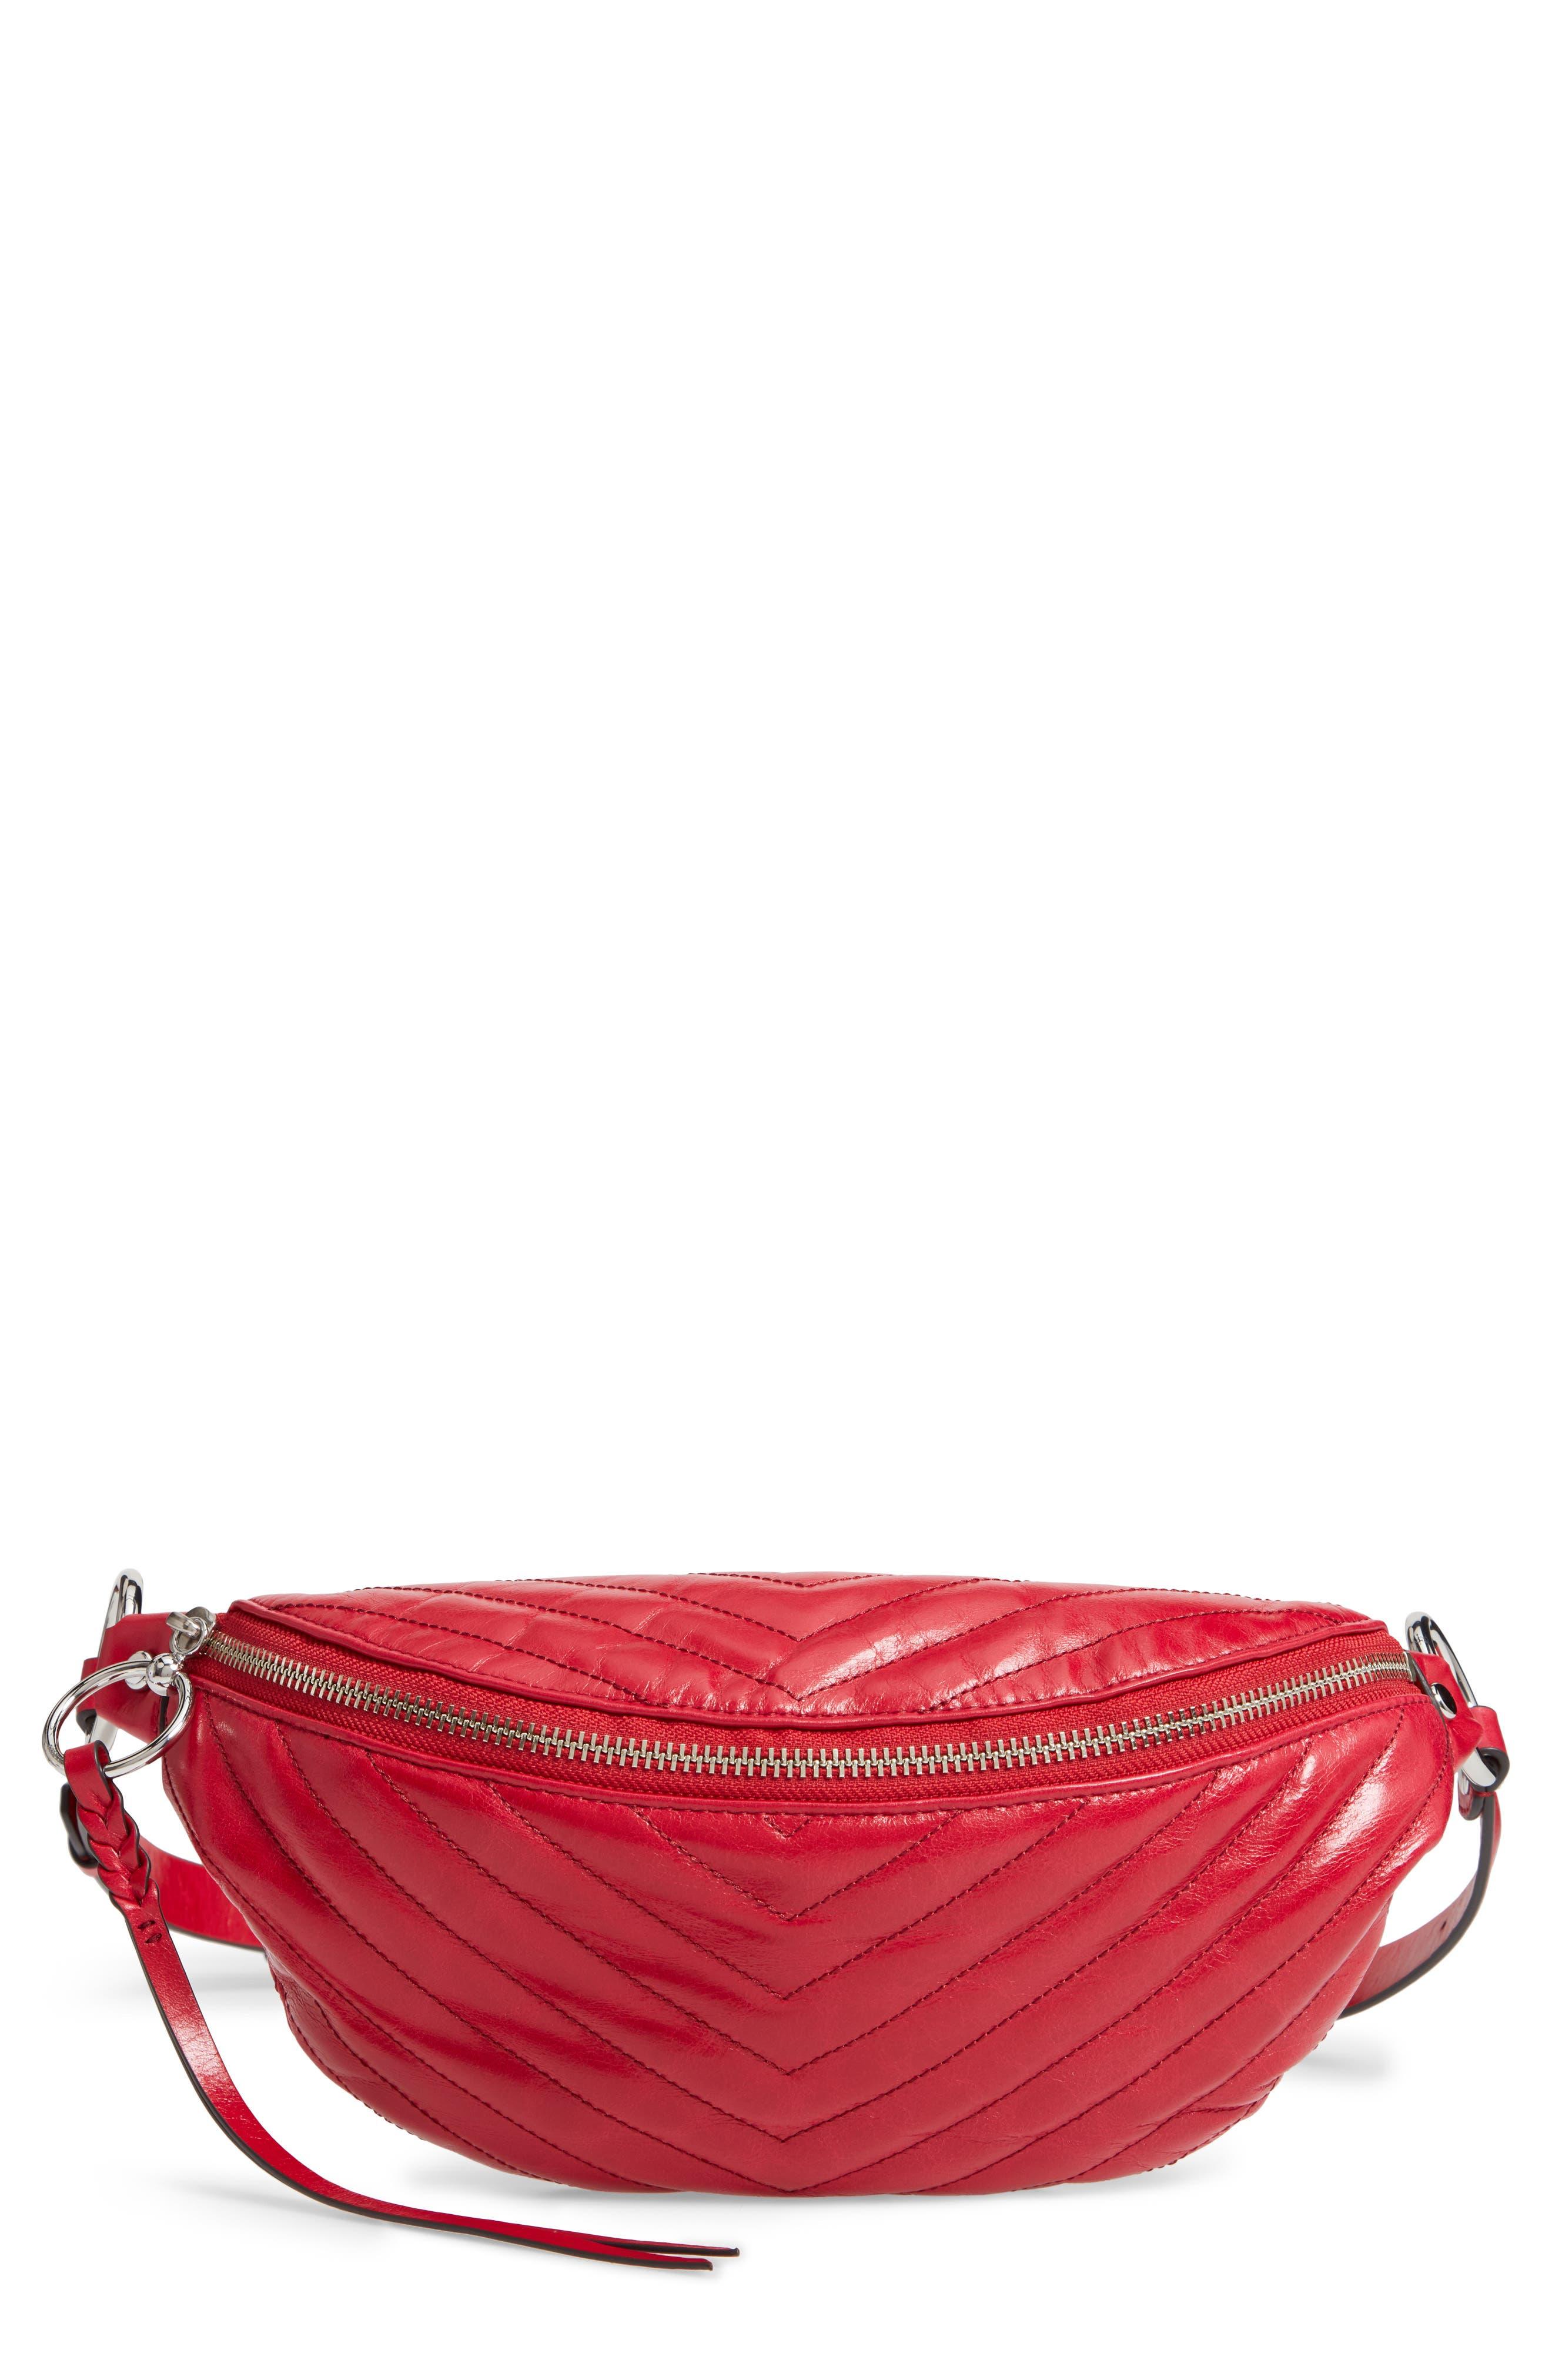 Edie Leather Belt Bag,                         Main,                         color, SCARLET